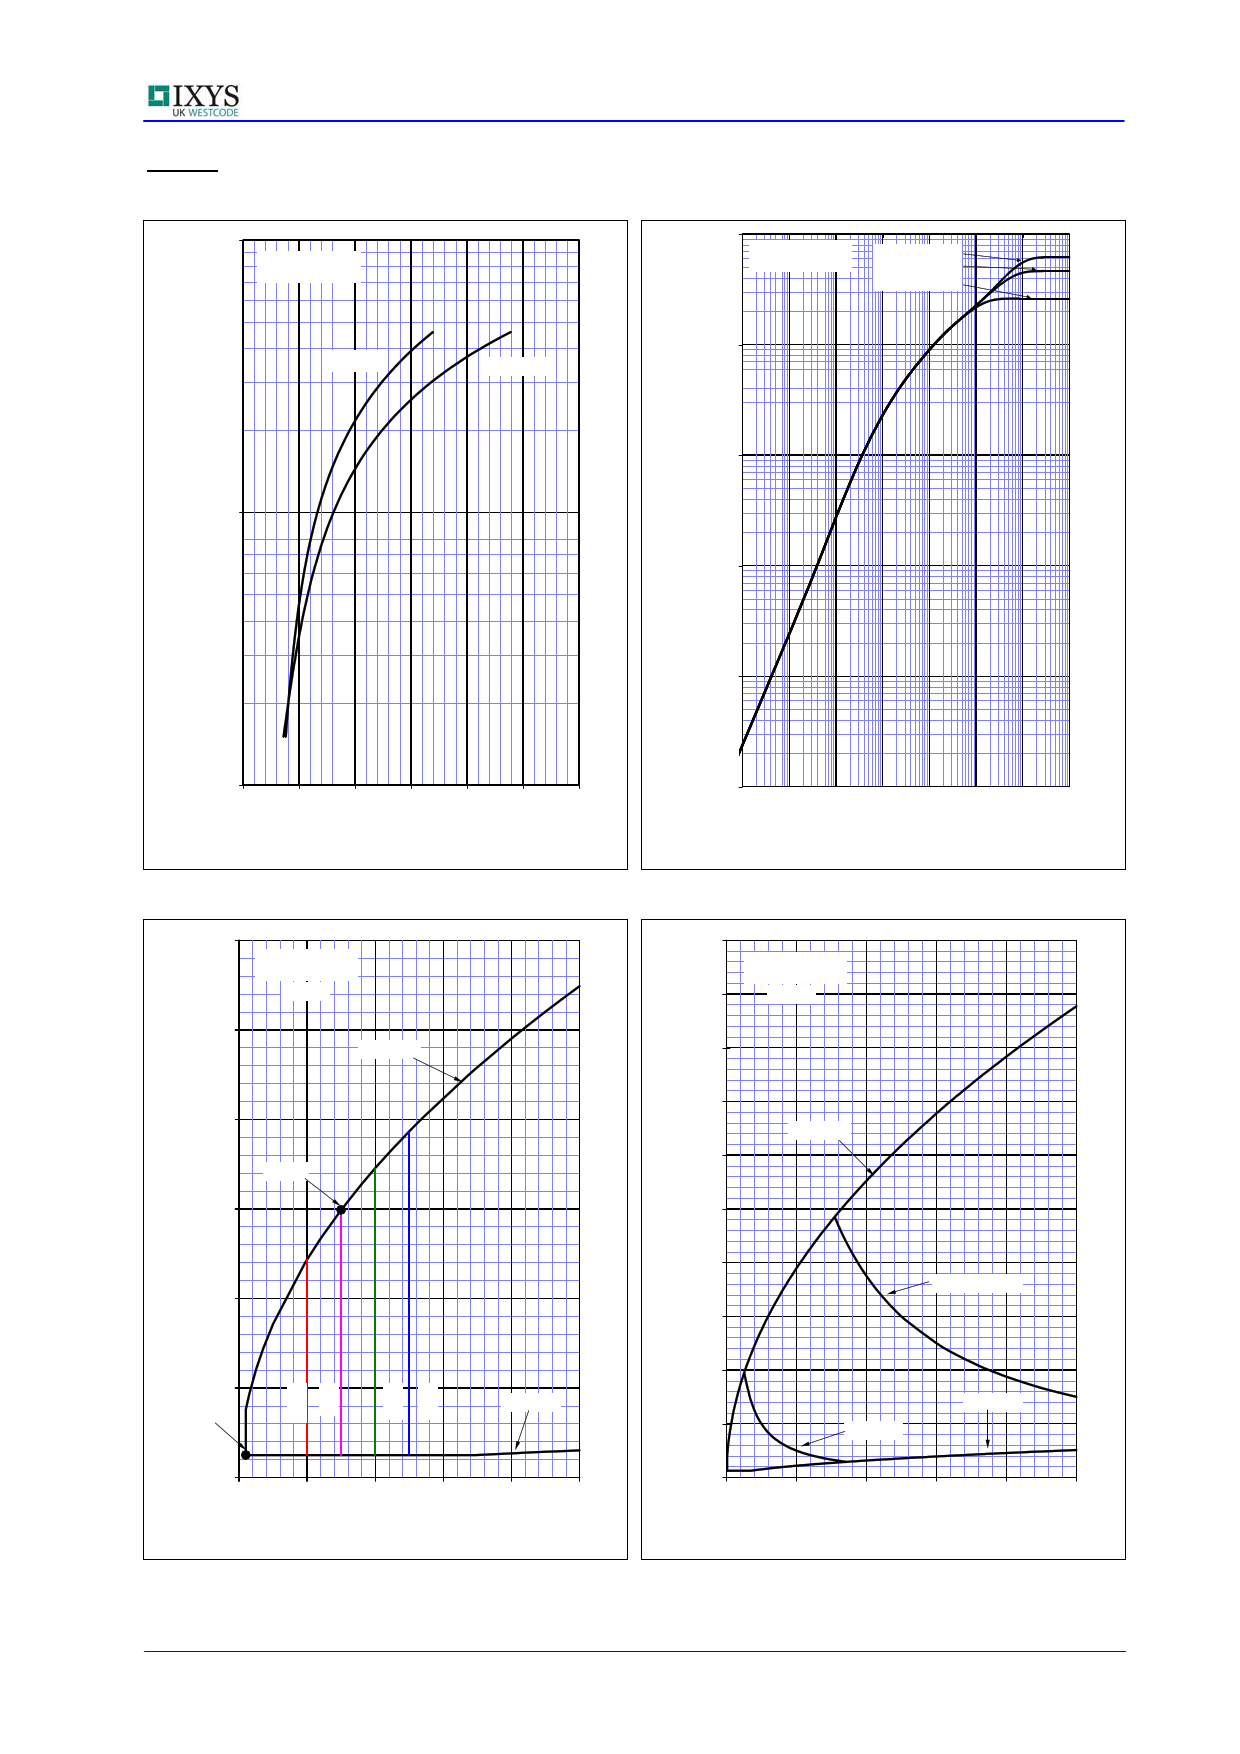 K0625QA600 pdf